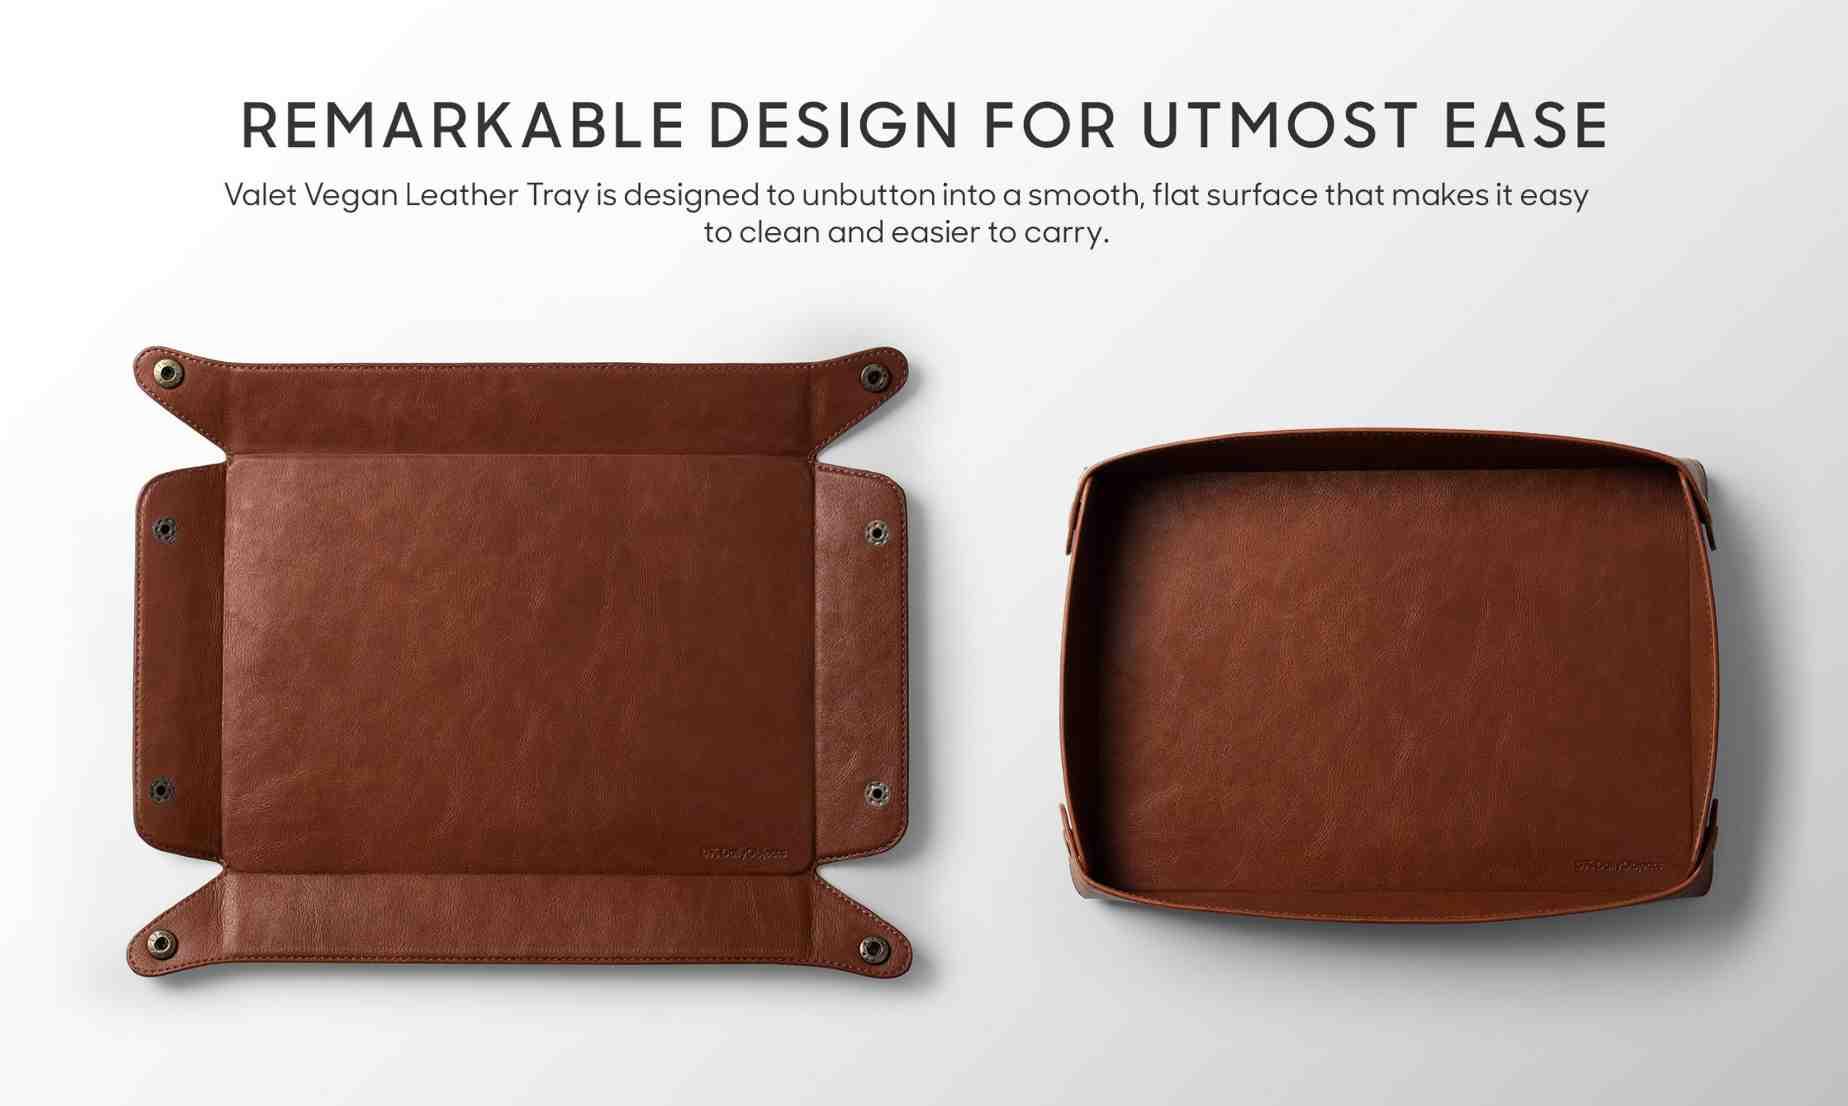 Valet Vegan Leather Tray (Tan)   Office Desk   Buy Online Kuwait UAE Saudi   KlippiK.com